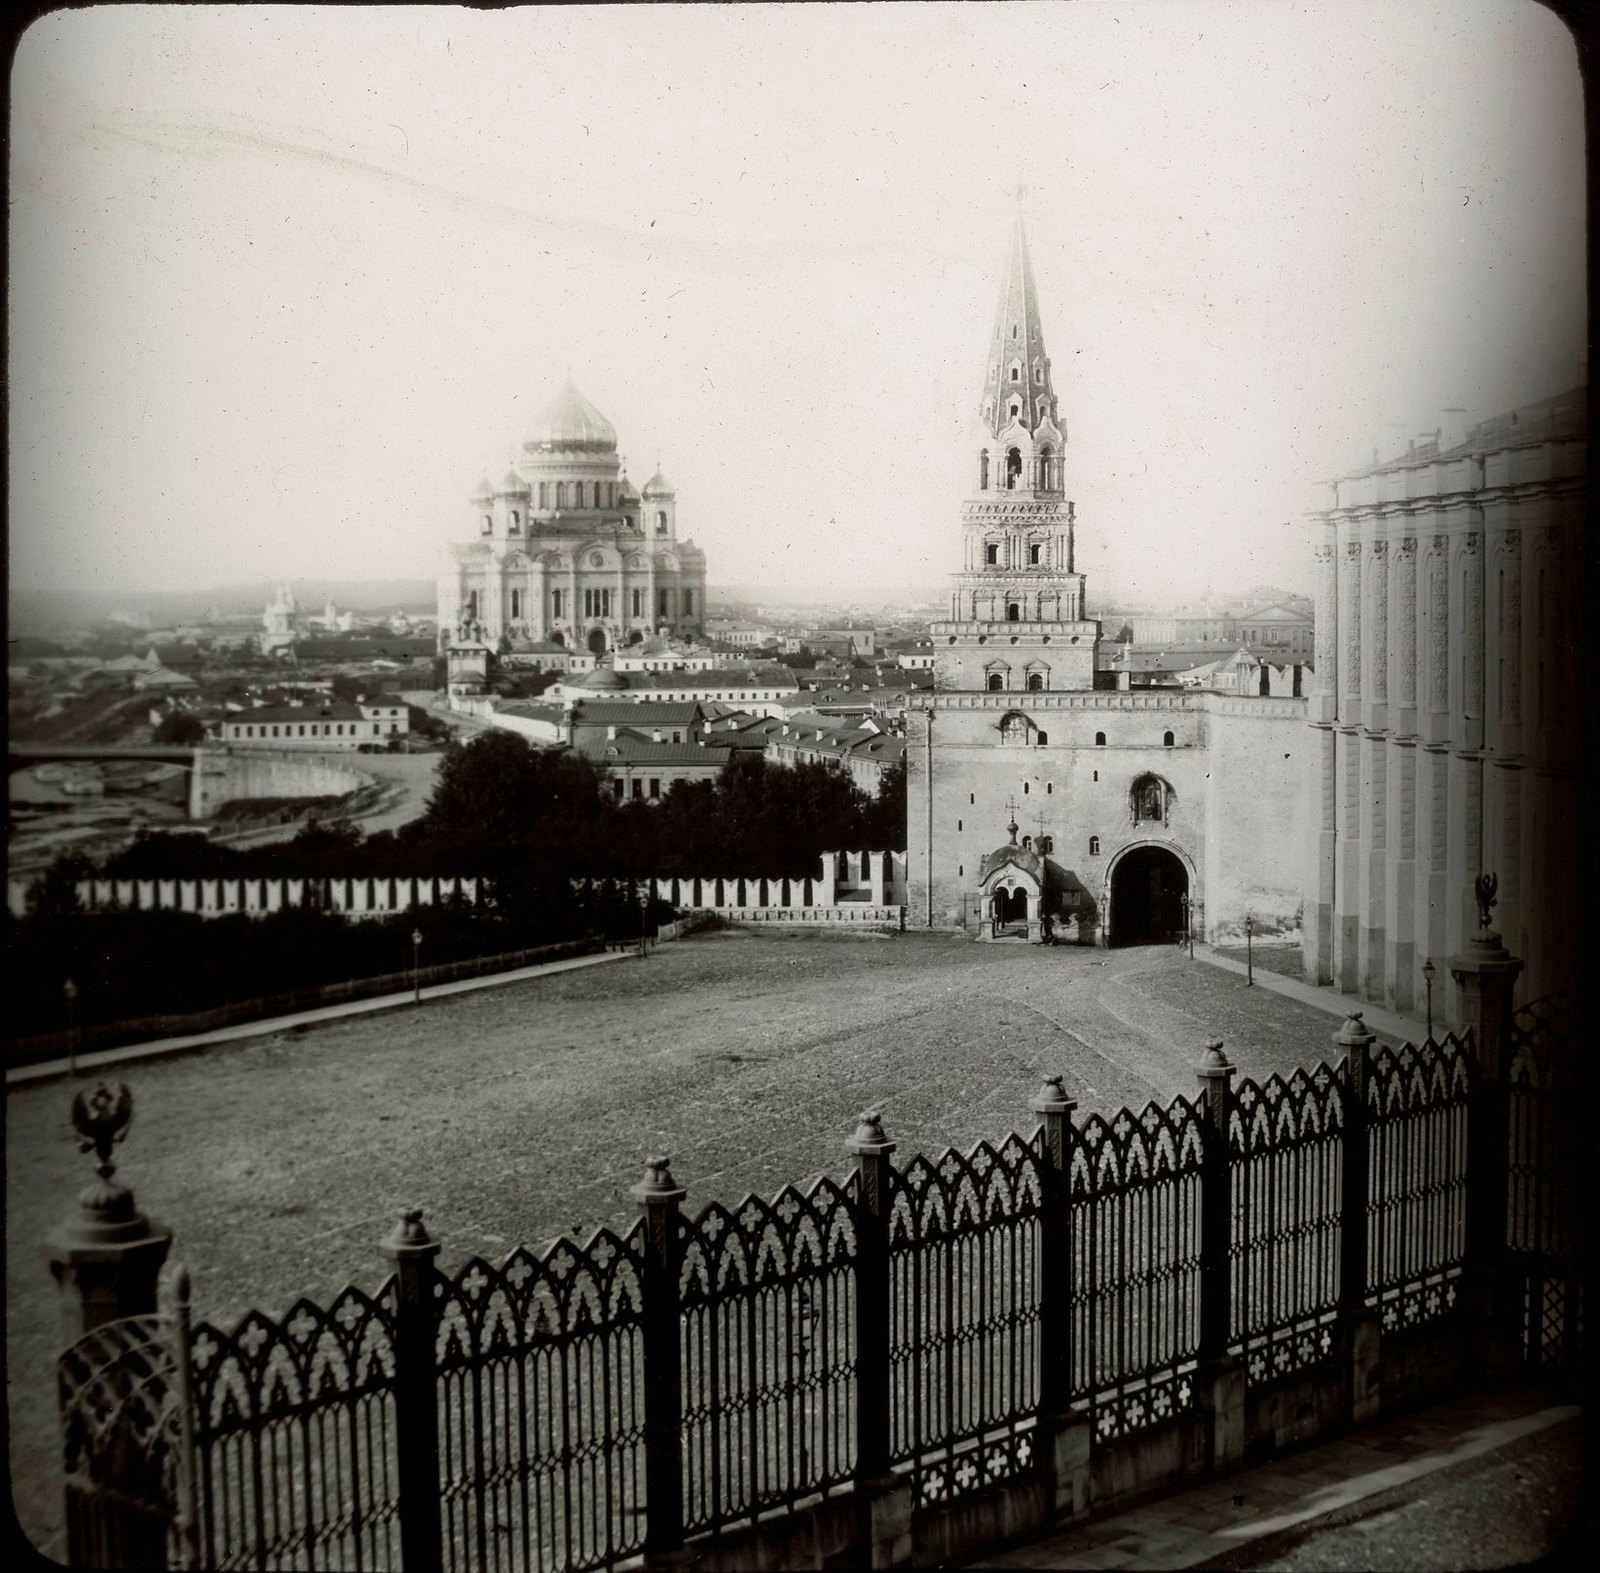 Москва. Боровицкие ворота и Храм Христа Спасителя